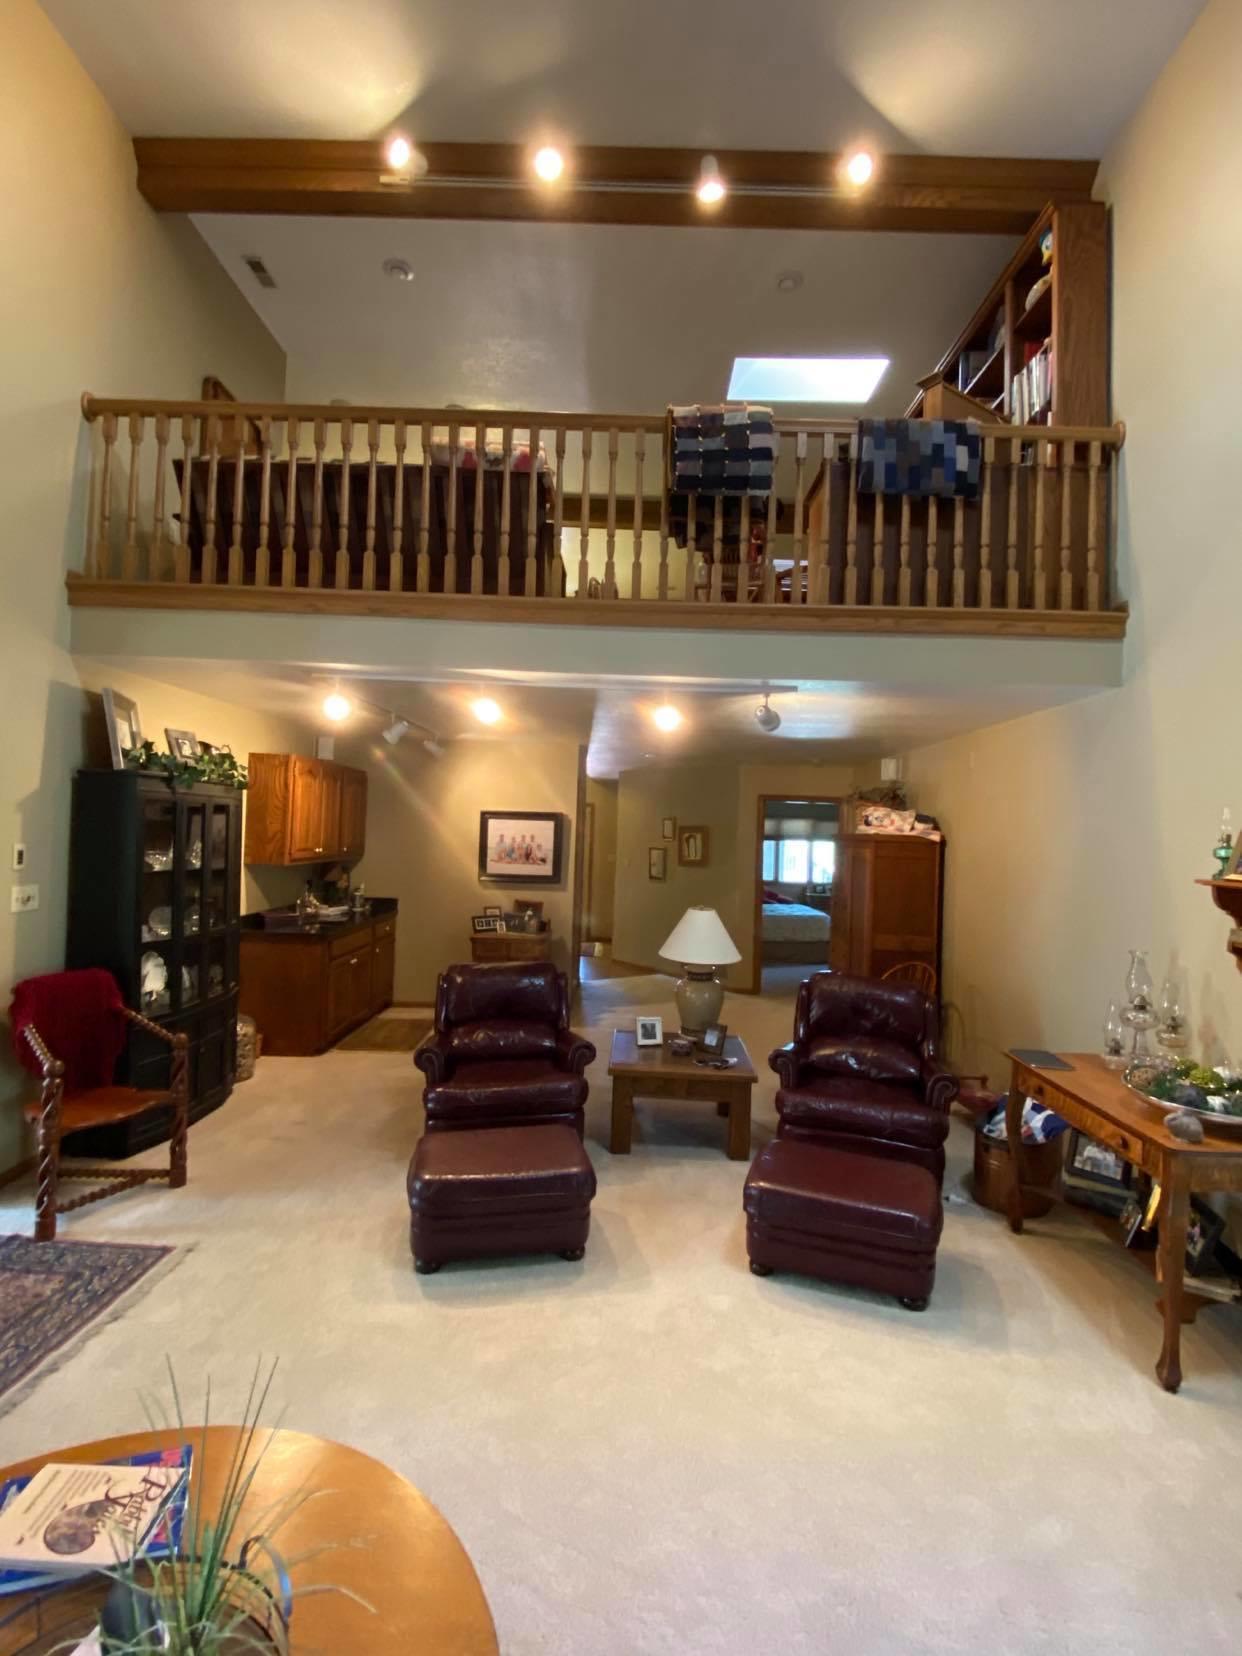 701 WINDSOR Avenue, Maryville, Missouri 64468, 4 Bedrooms Bedrooms, ,2.5 BathroomsBathrooms,Residential,WINDSOR,4800